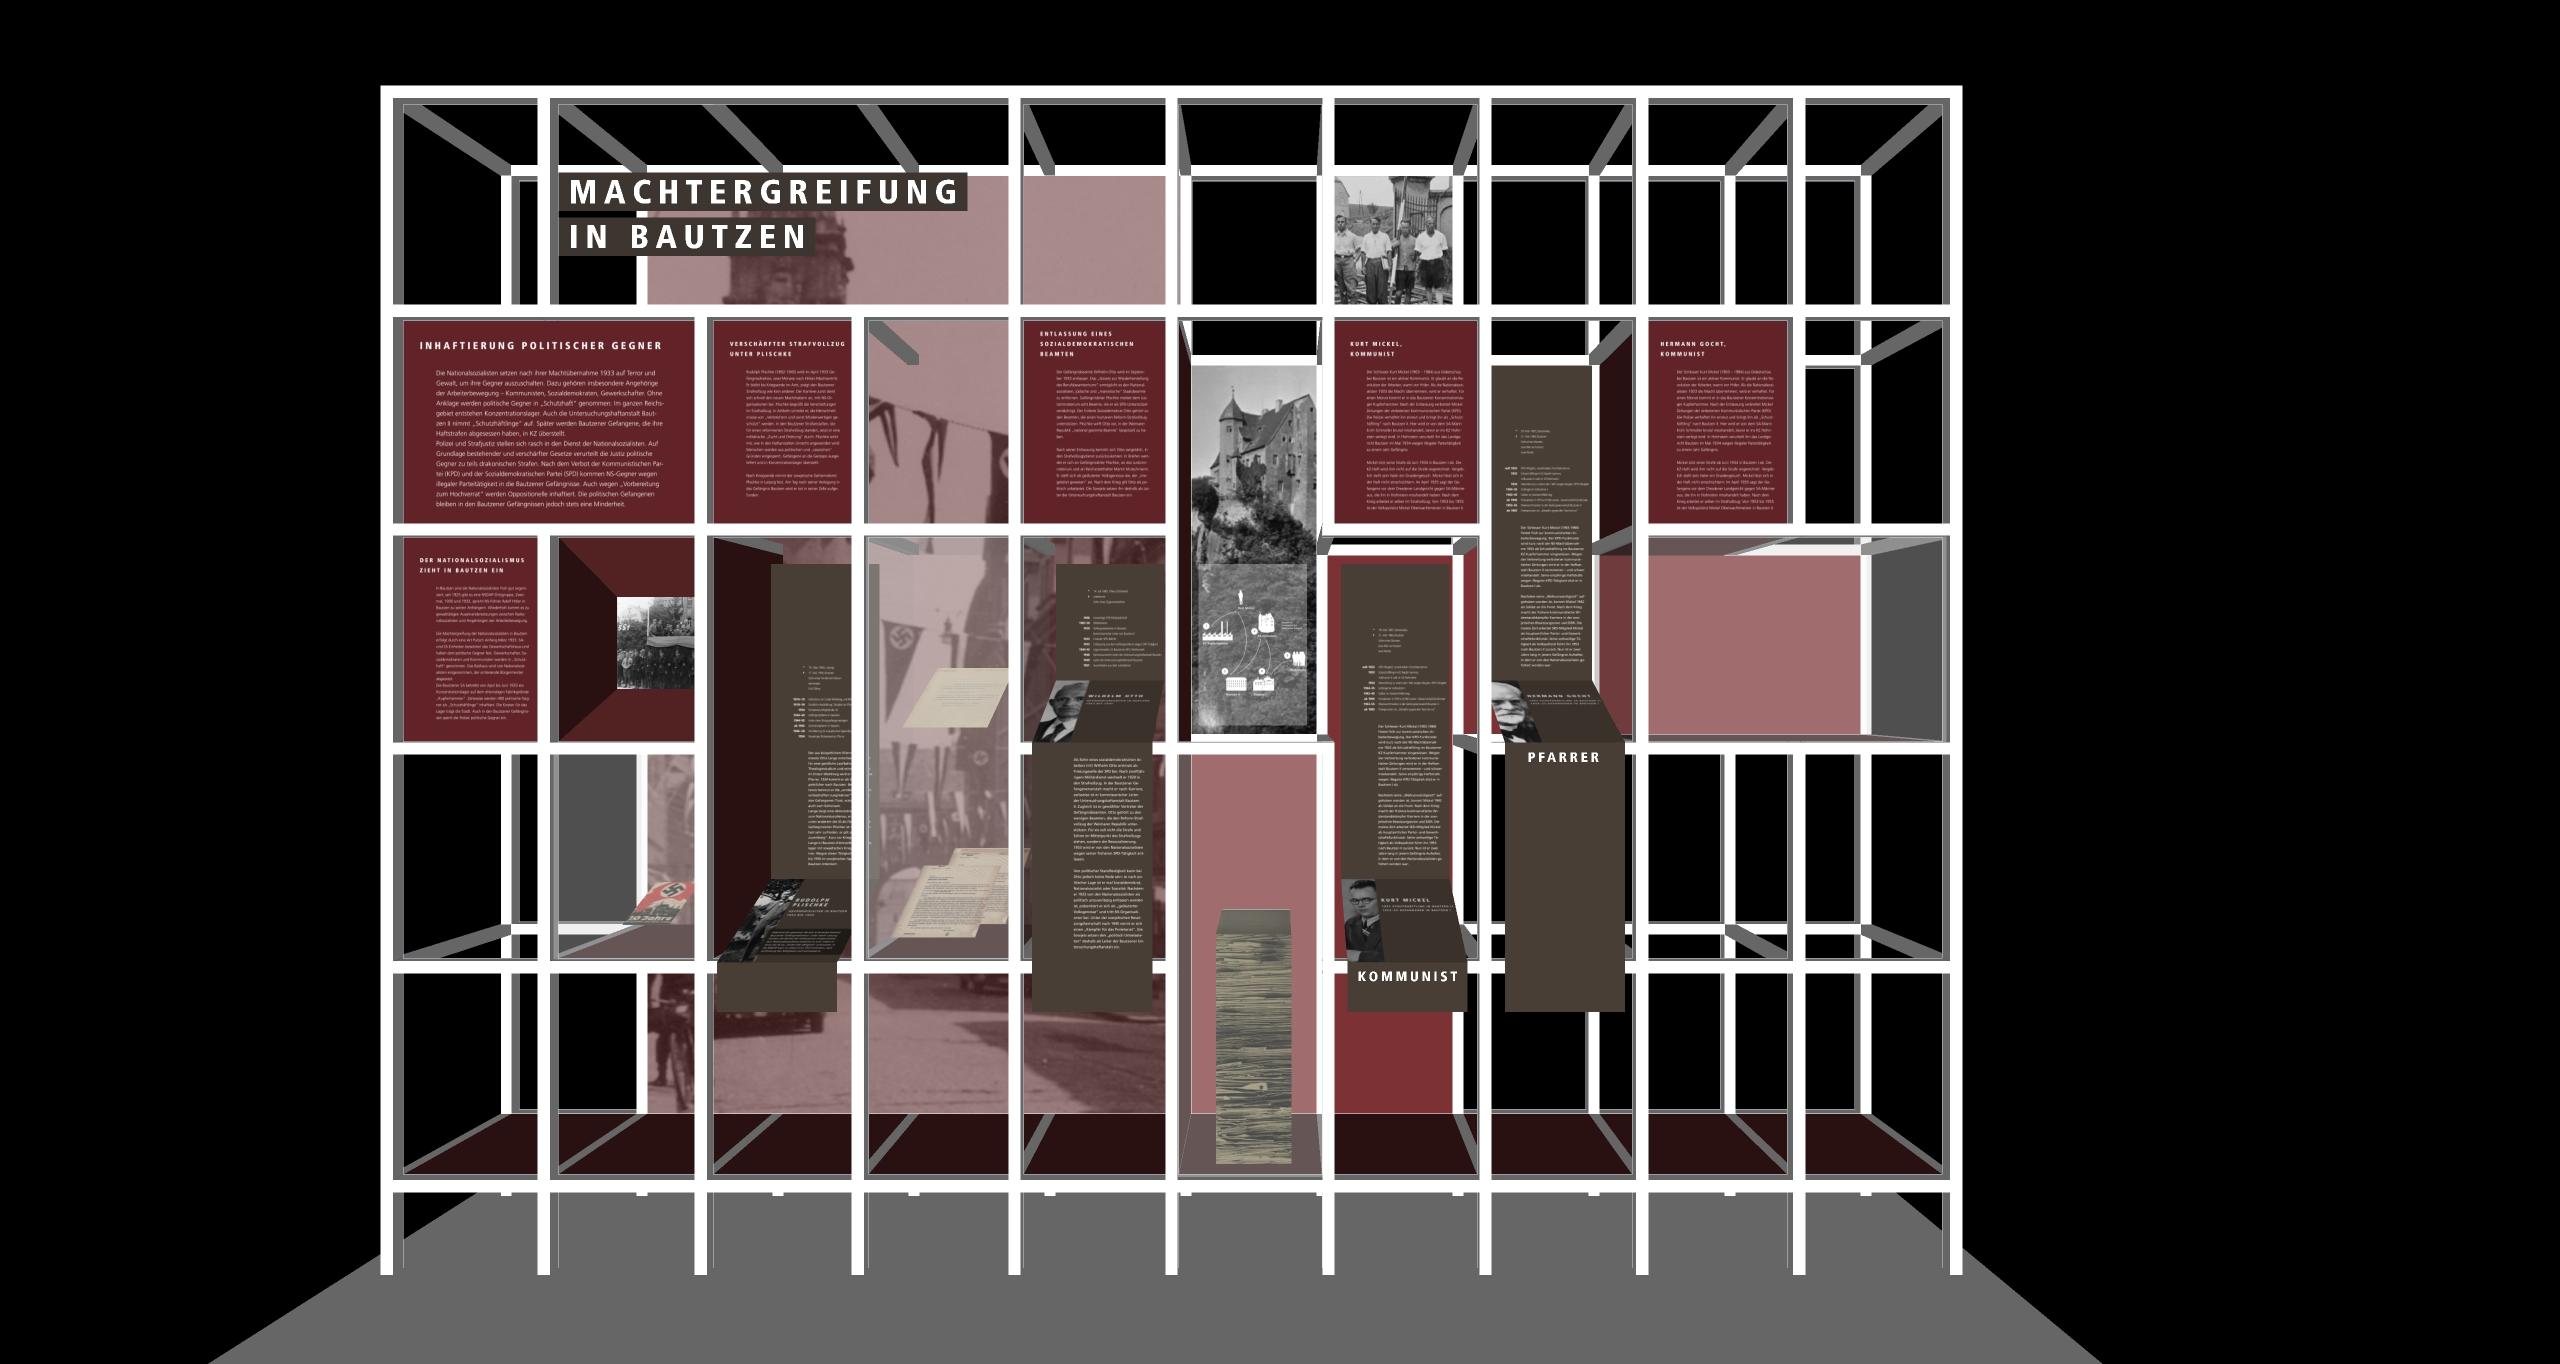 "<span class=""deutsch"">Wandabwicklung der Ausstellung Haft unterm Hakenkreuz</span><span class=""englisch"">Wall layout of the exhibition »Haft unterm Hakenkreuz«</span>"